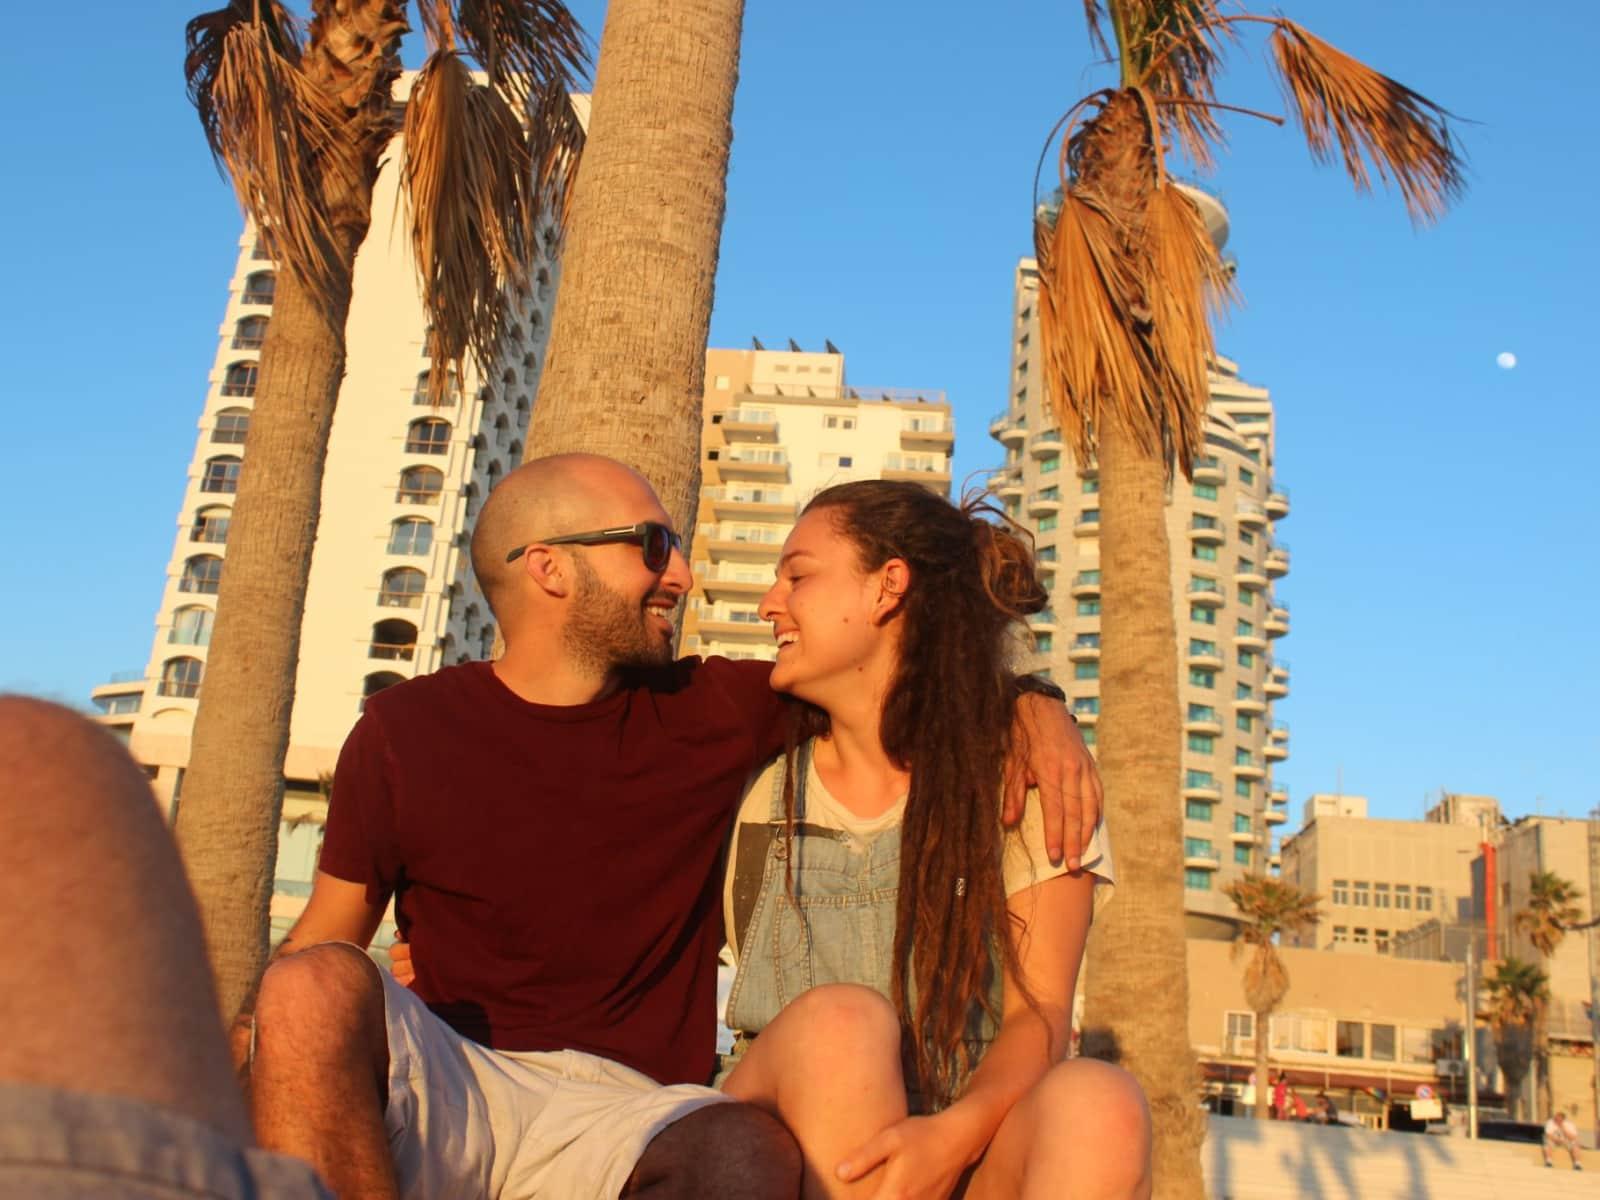 Daniella & Max from Los Angeles, California, United States